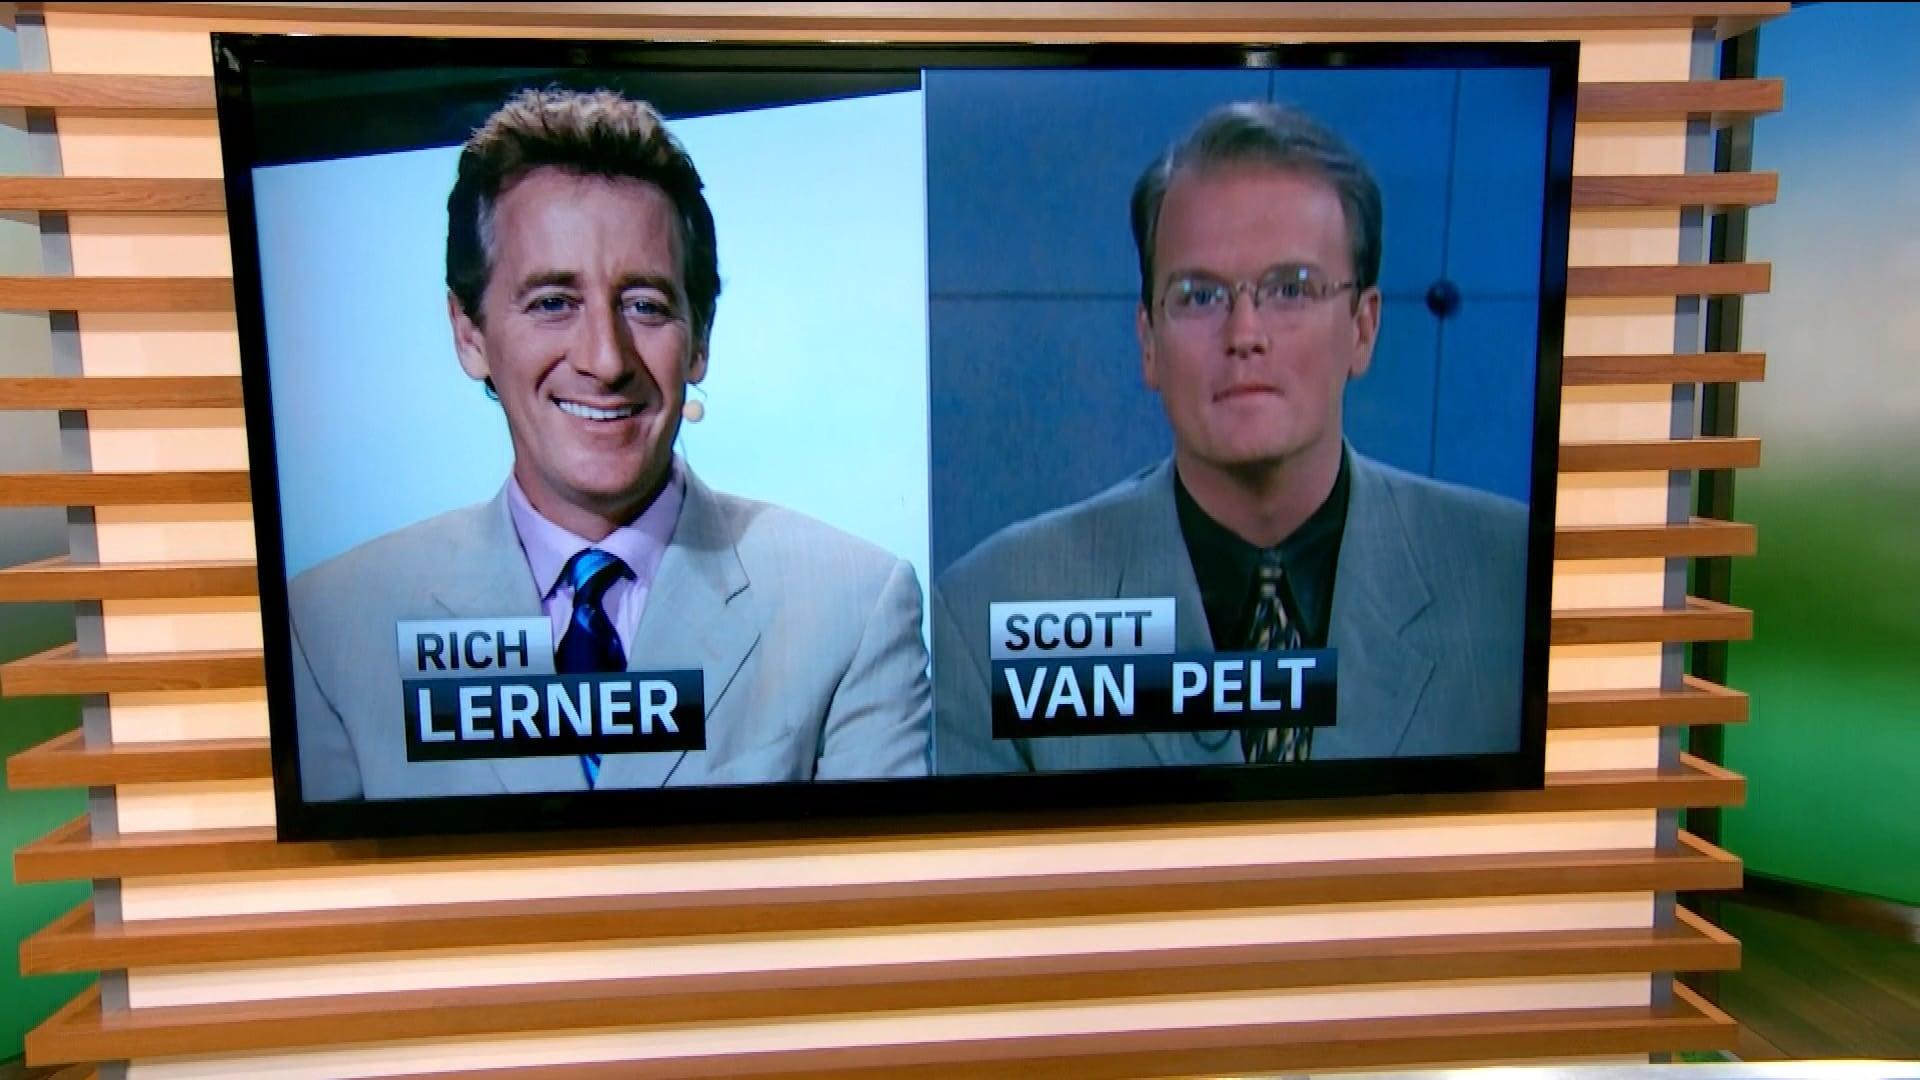 Scott Van Pelt and Rich Lerner Reminisce Past 20 years ...